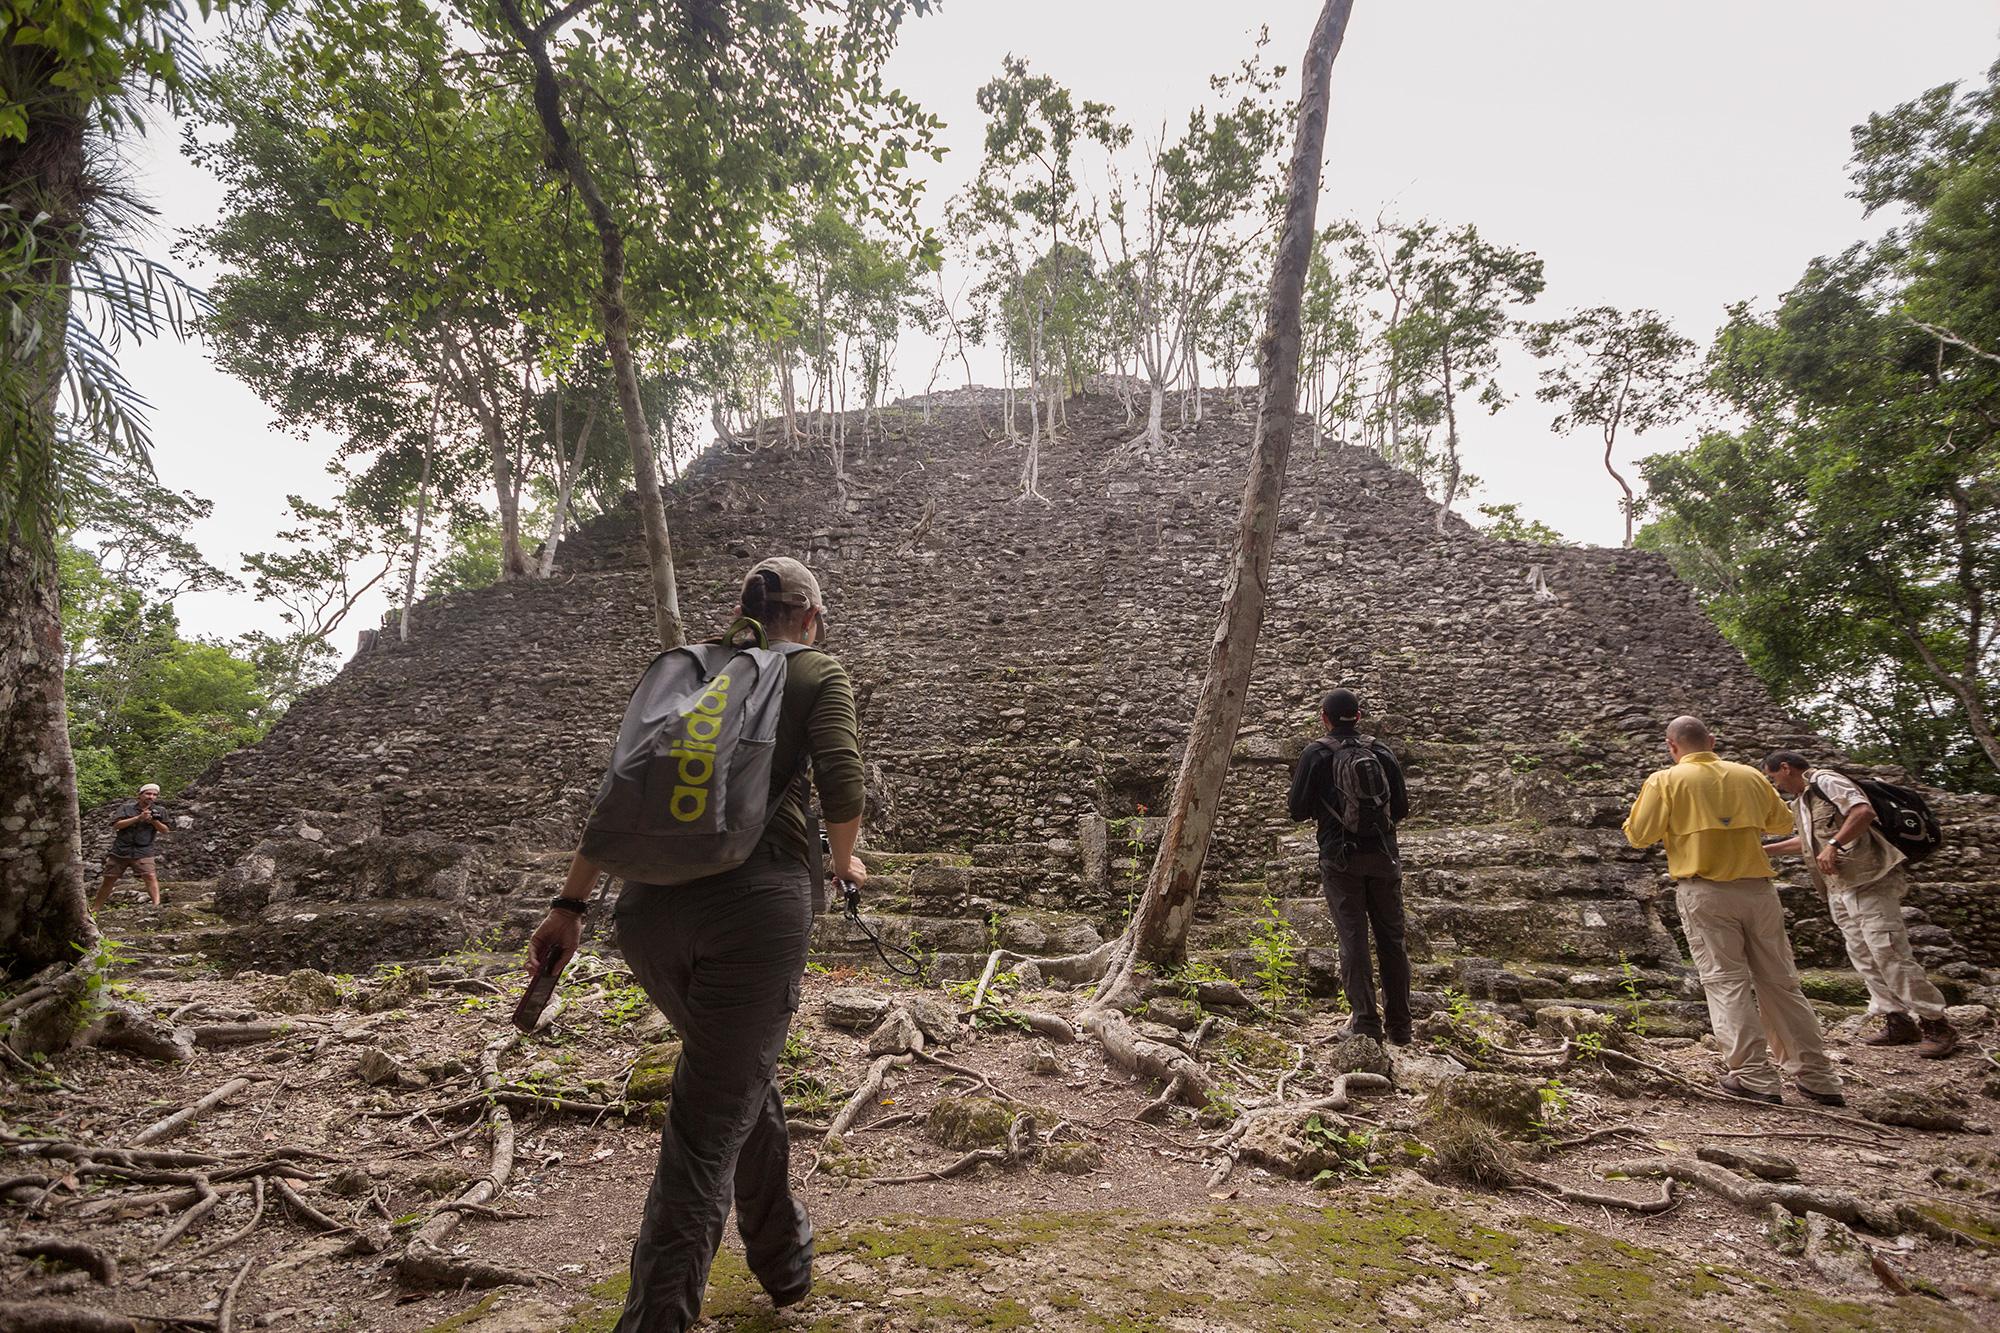 El Mirador, Petén, Guatemala.